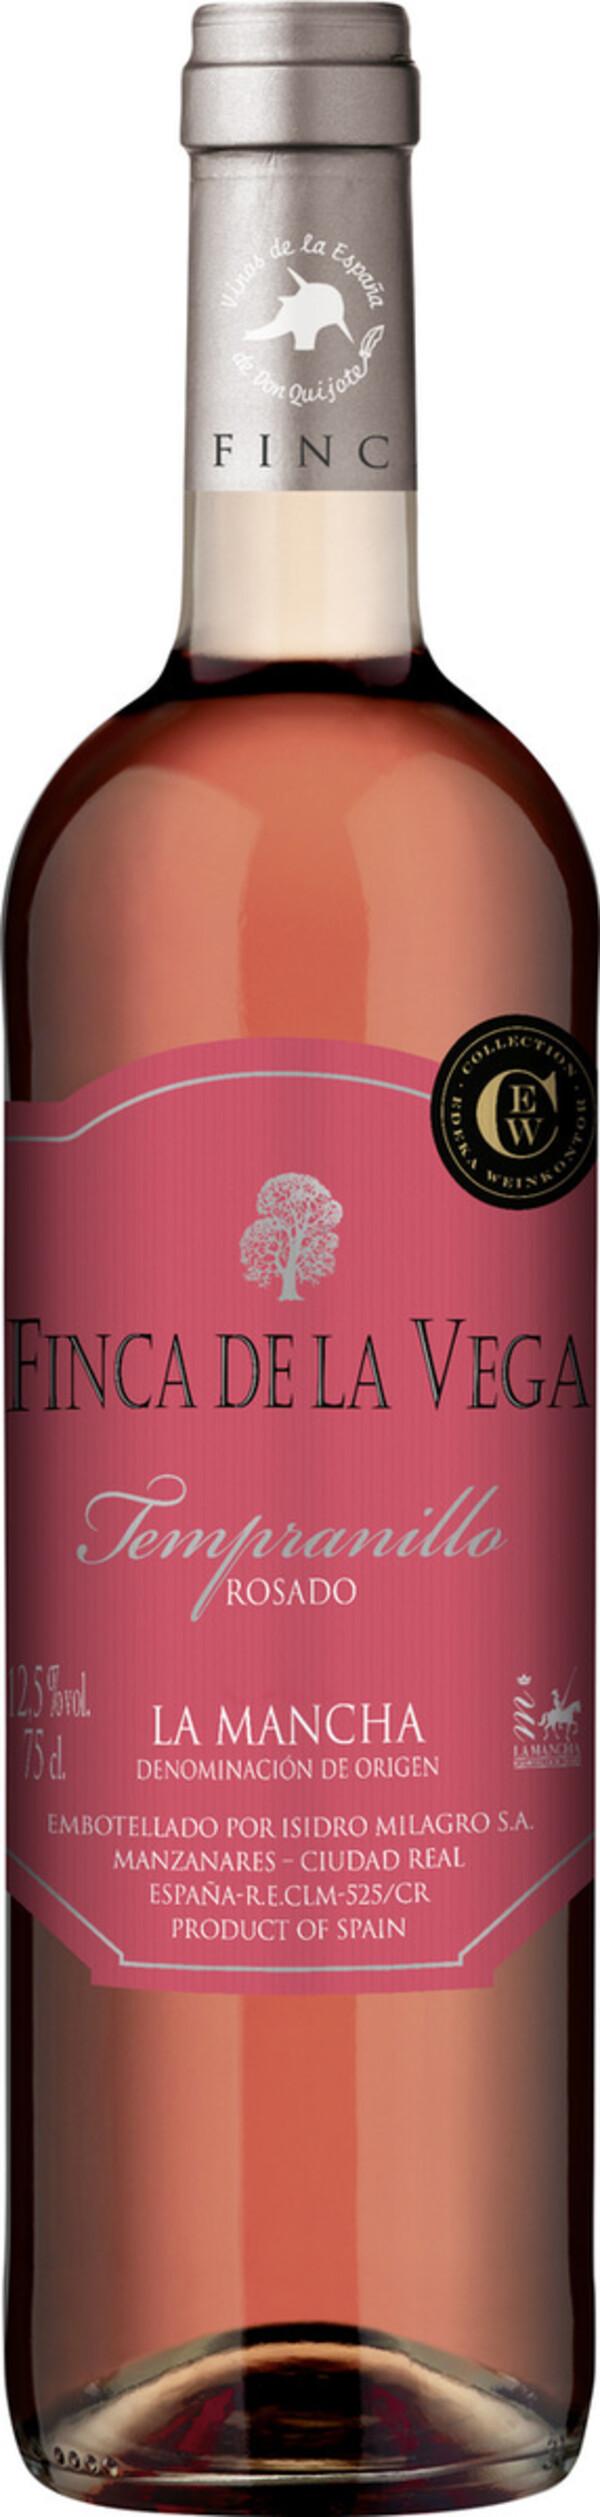 Finca de la Vega Tempranillo Rosado 2019 0,75L